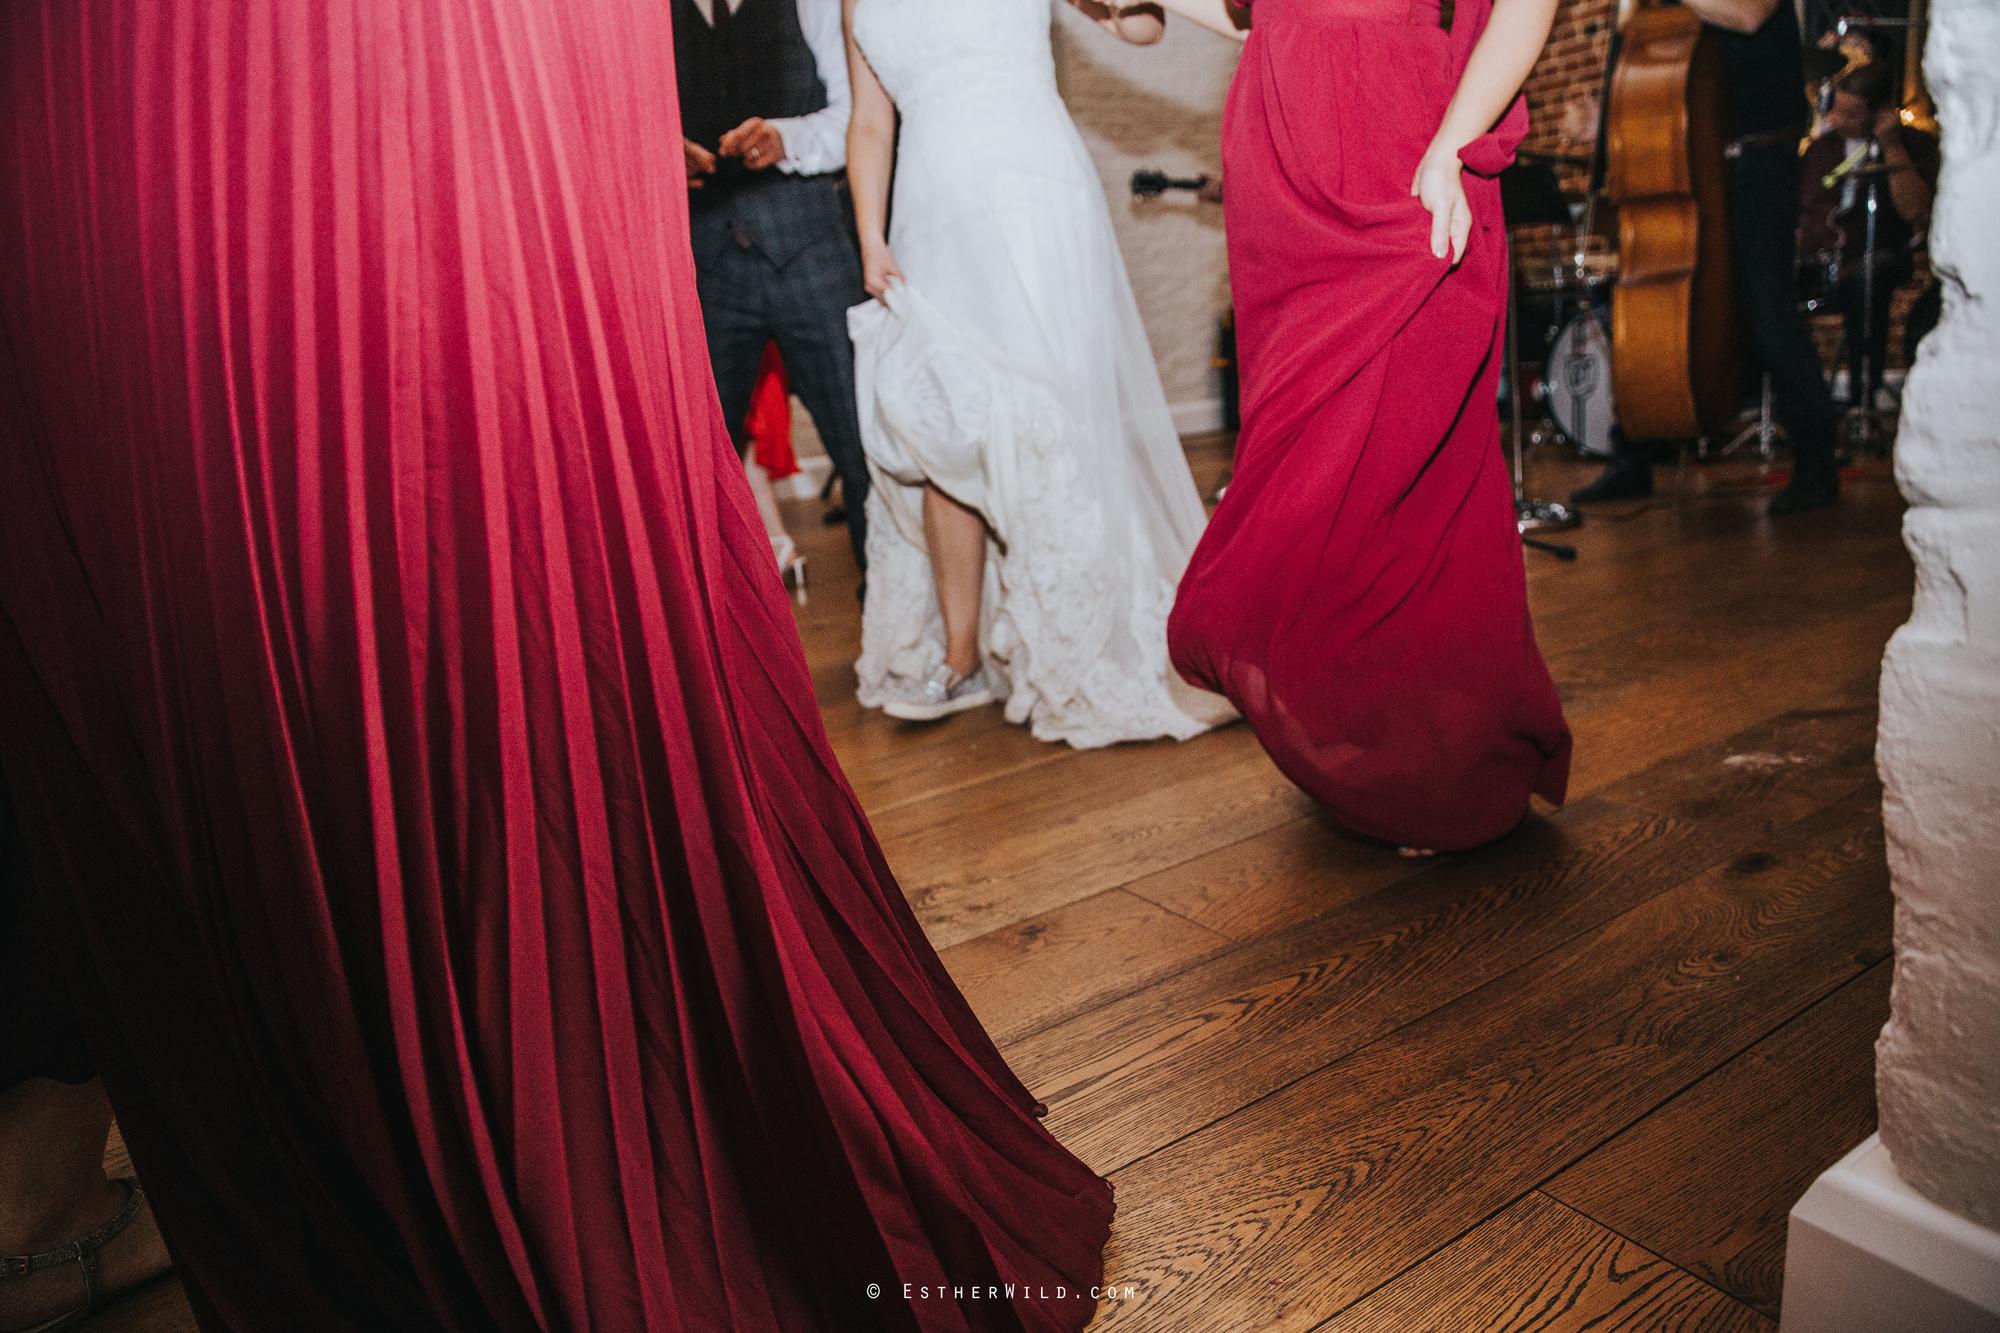 Reading_Room_Weddings_Alby_Norwich_Photographer_Esther_Wild_IMG_4150.jpg